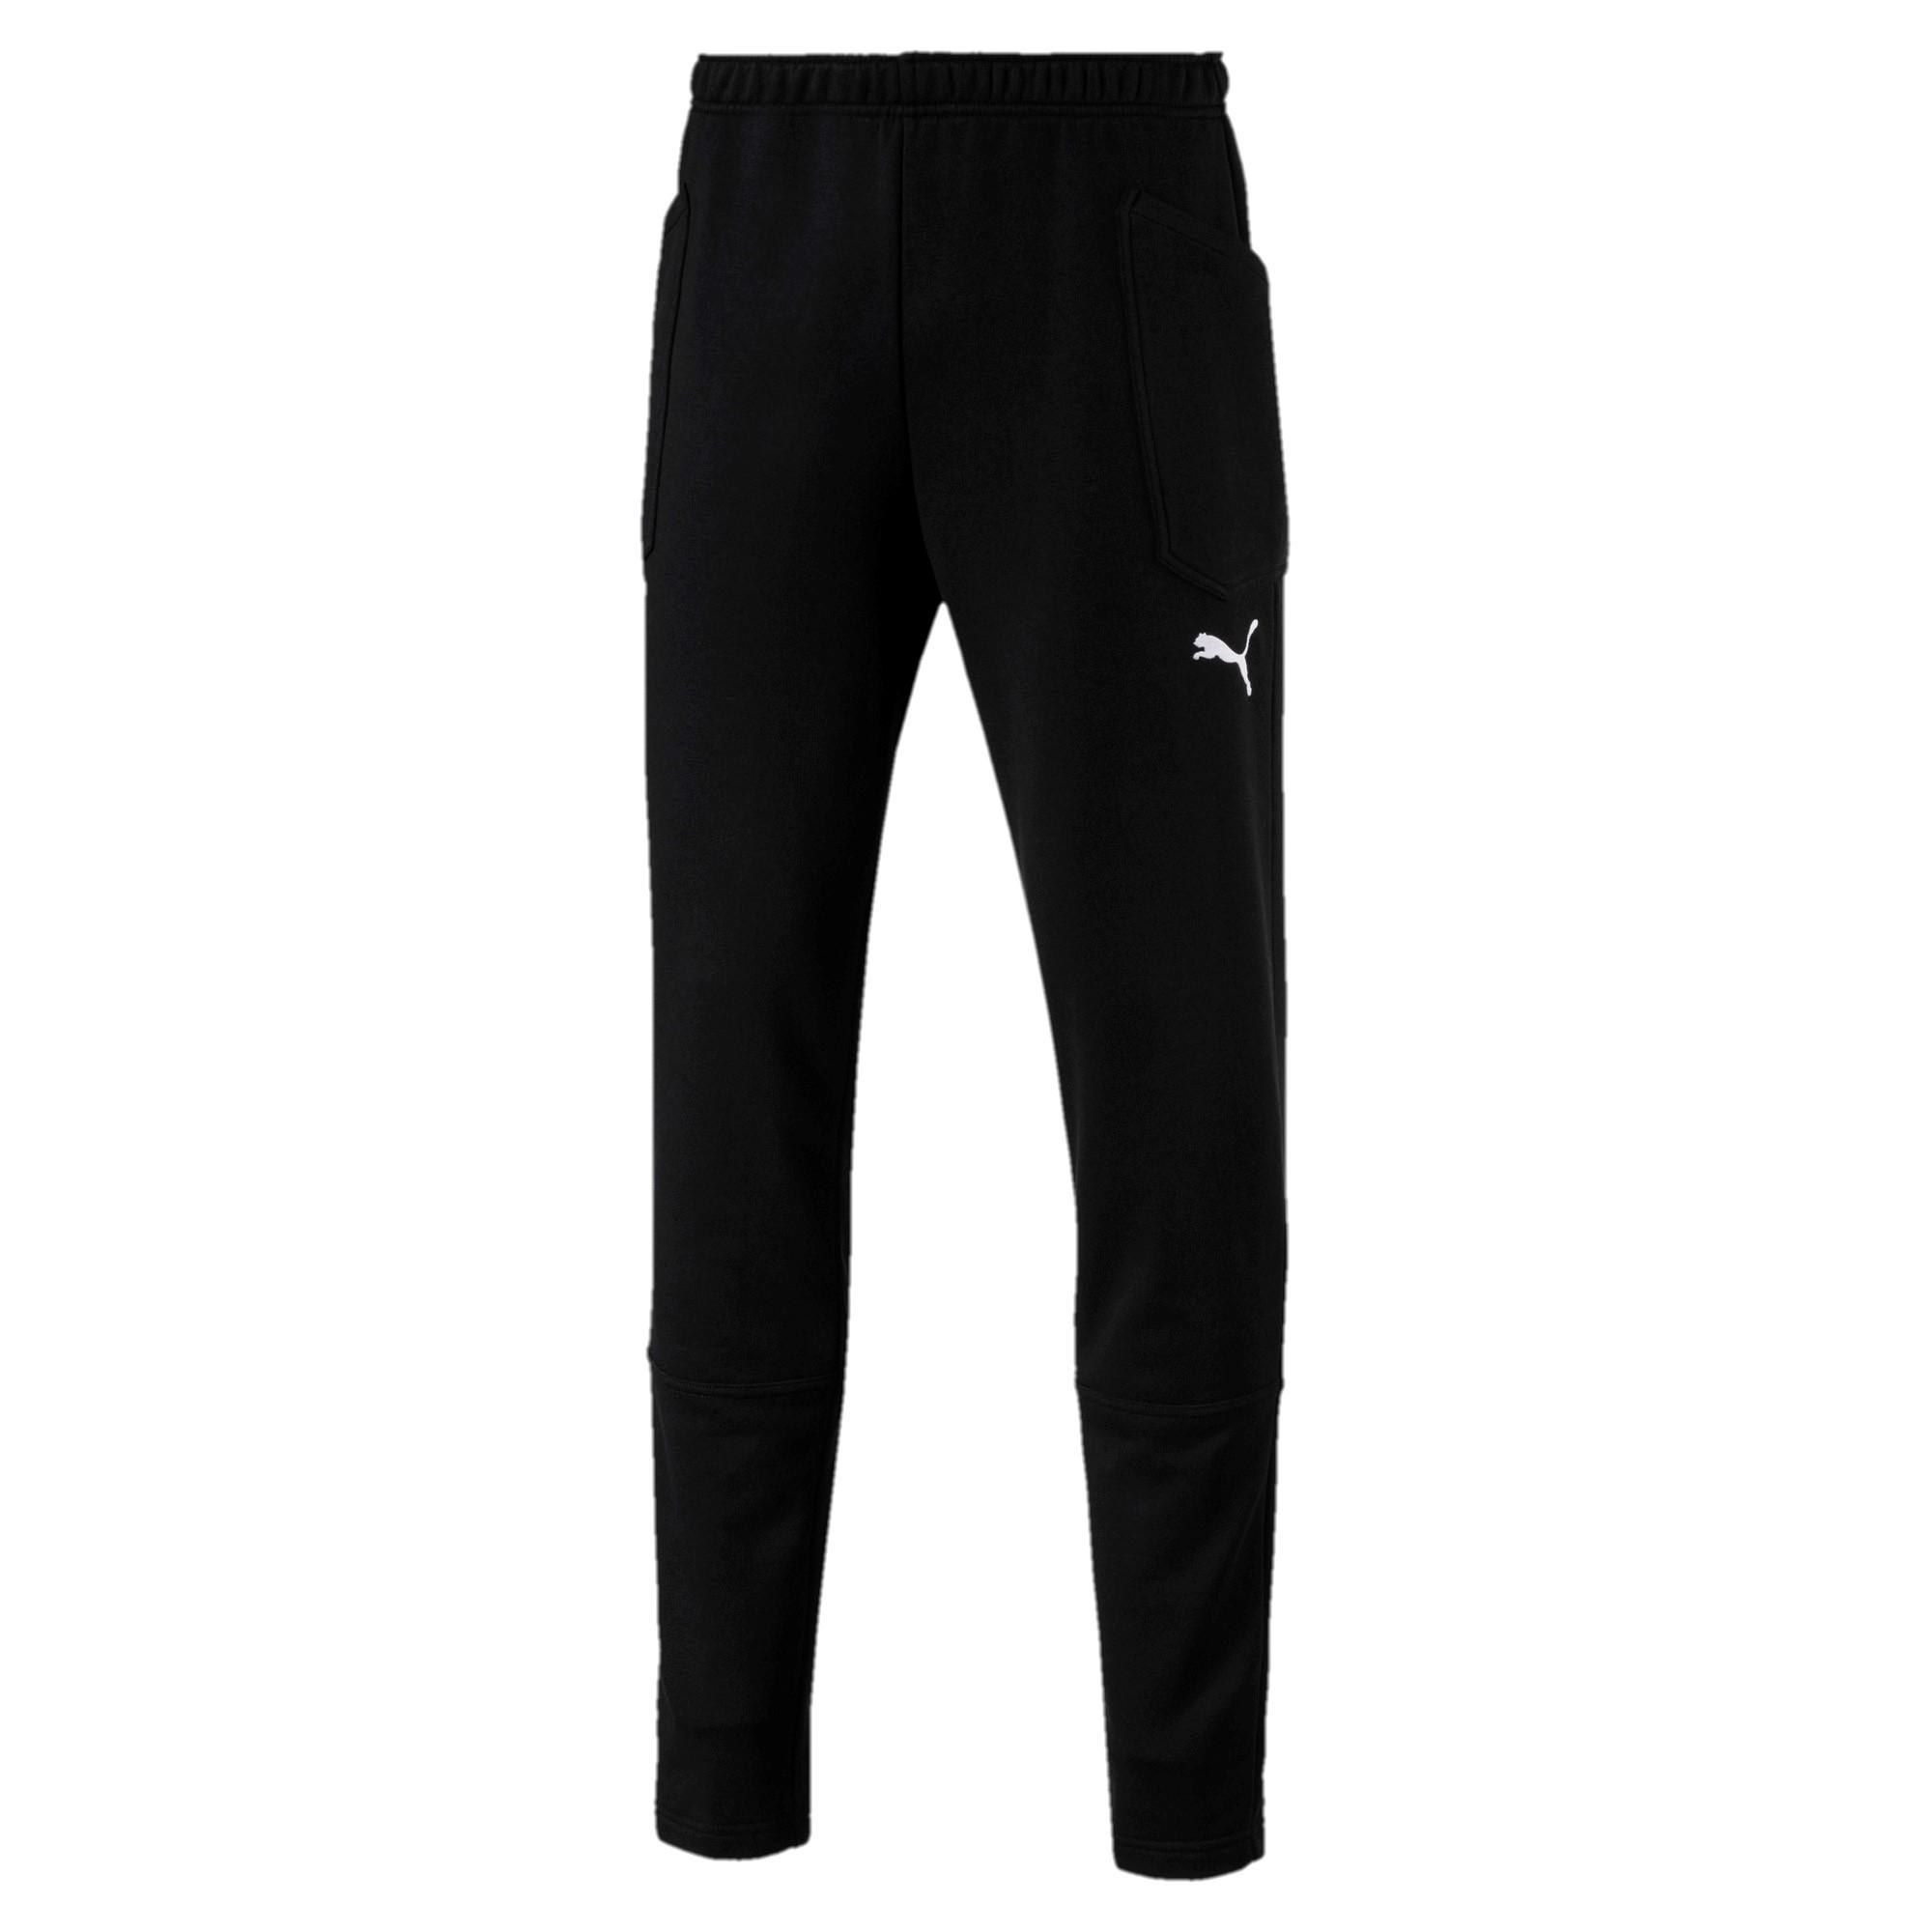 Ligua Casual Pantalon black (prix adultes/ juniors)